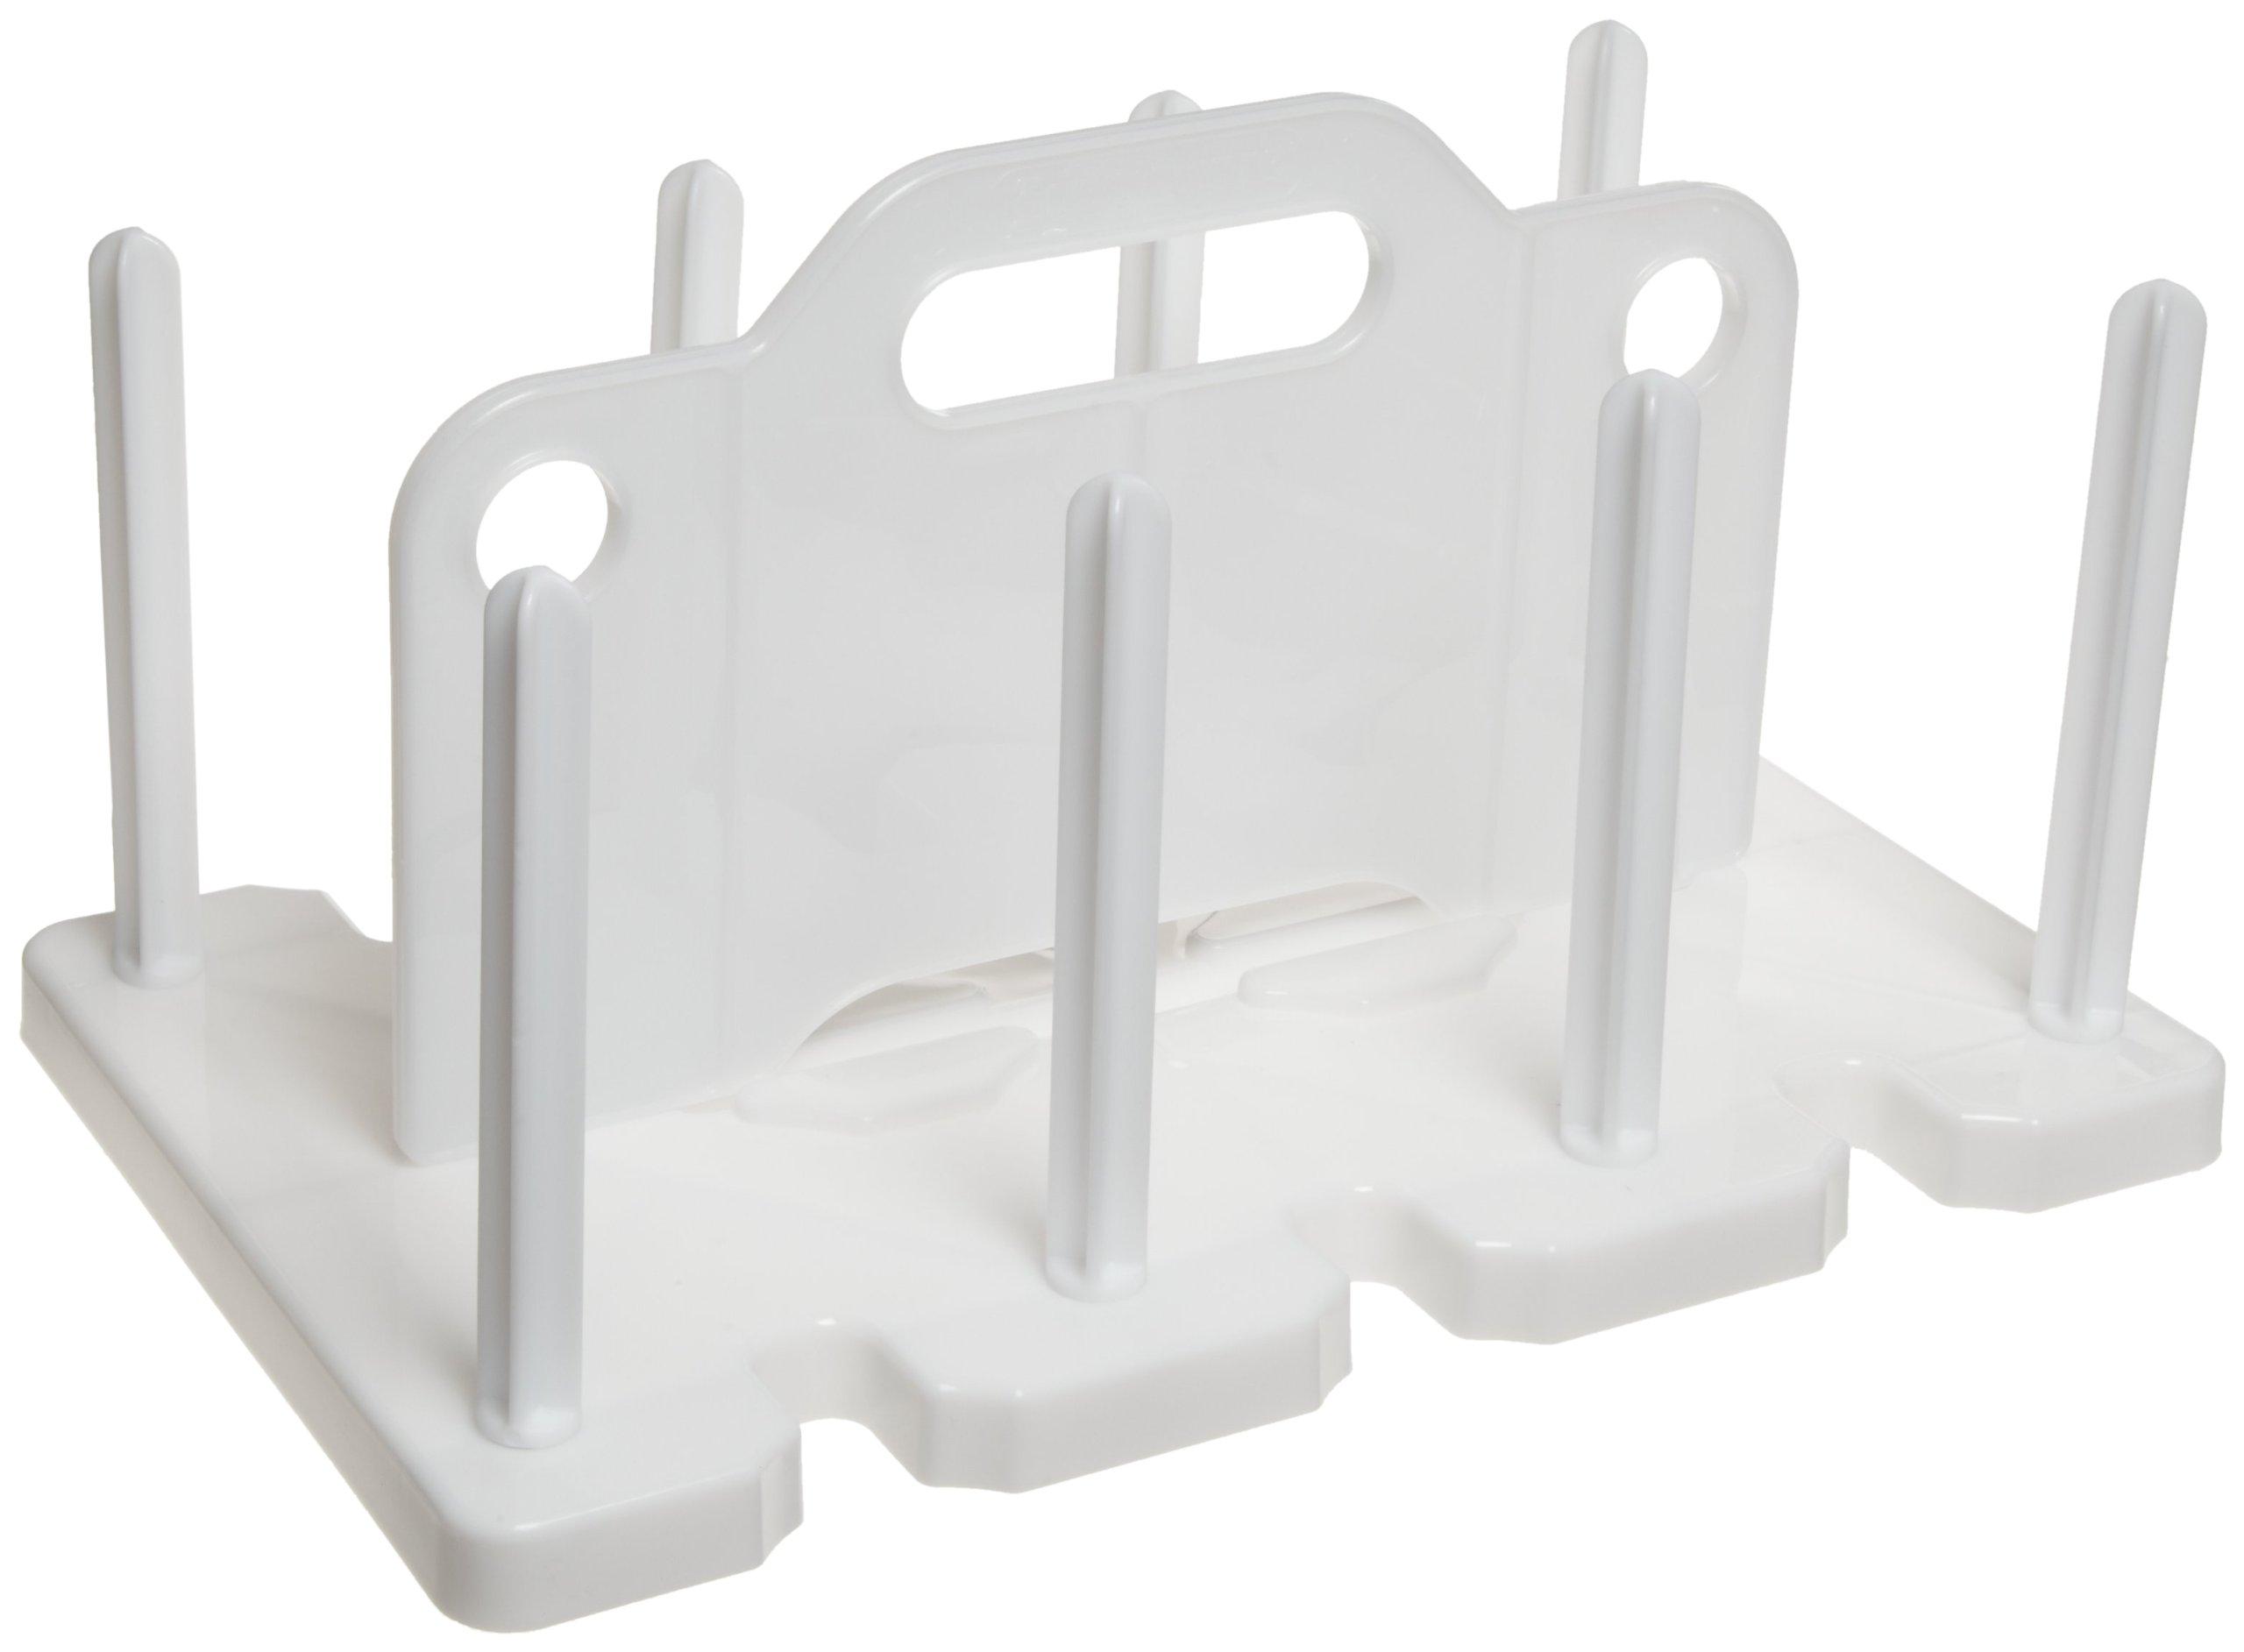 Bel-Art 100mm Petri Dish Rack; 42 Places, Plastic (F18991-0000)